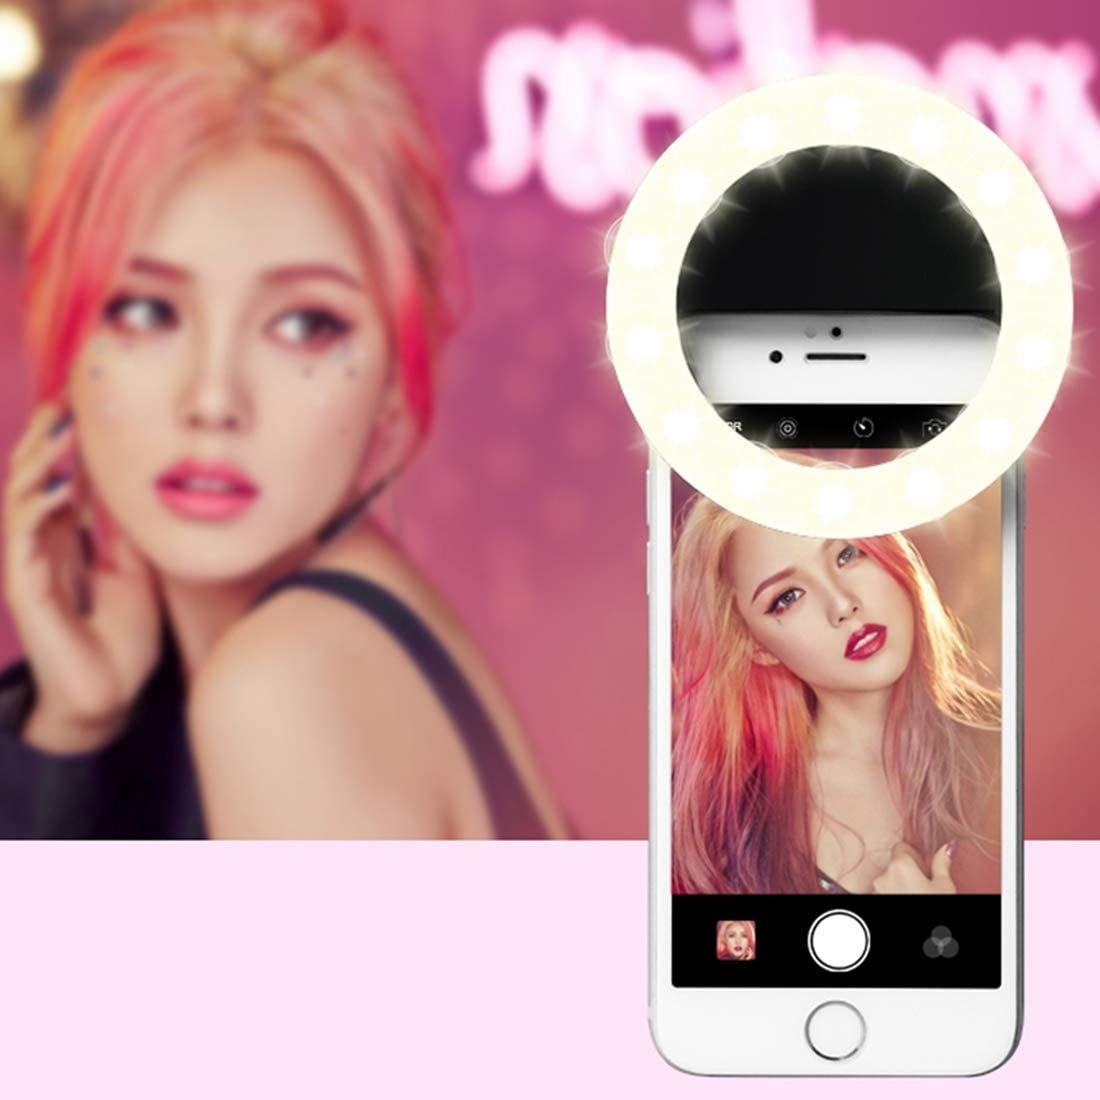 AEIOU RK14 Anchor Beauty Artifact Selfie Flashlight with 3 Brightness, 33 LED Lights (Color : Black)